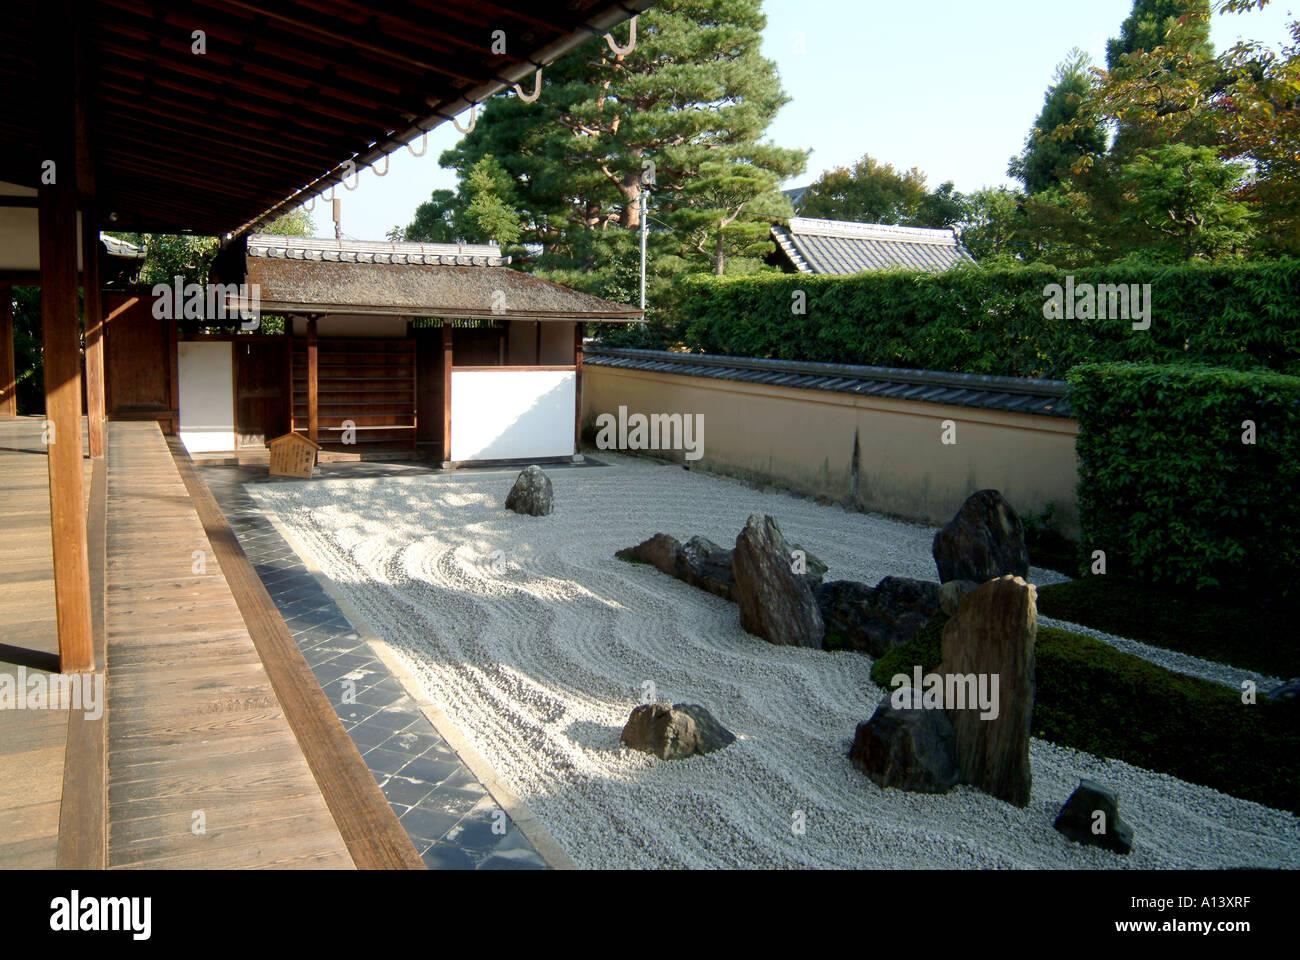 Zen raked gravel garden at Zuiho-in within Daitokuji Temple Kyoto Japan - Stock Image